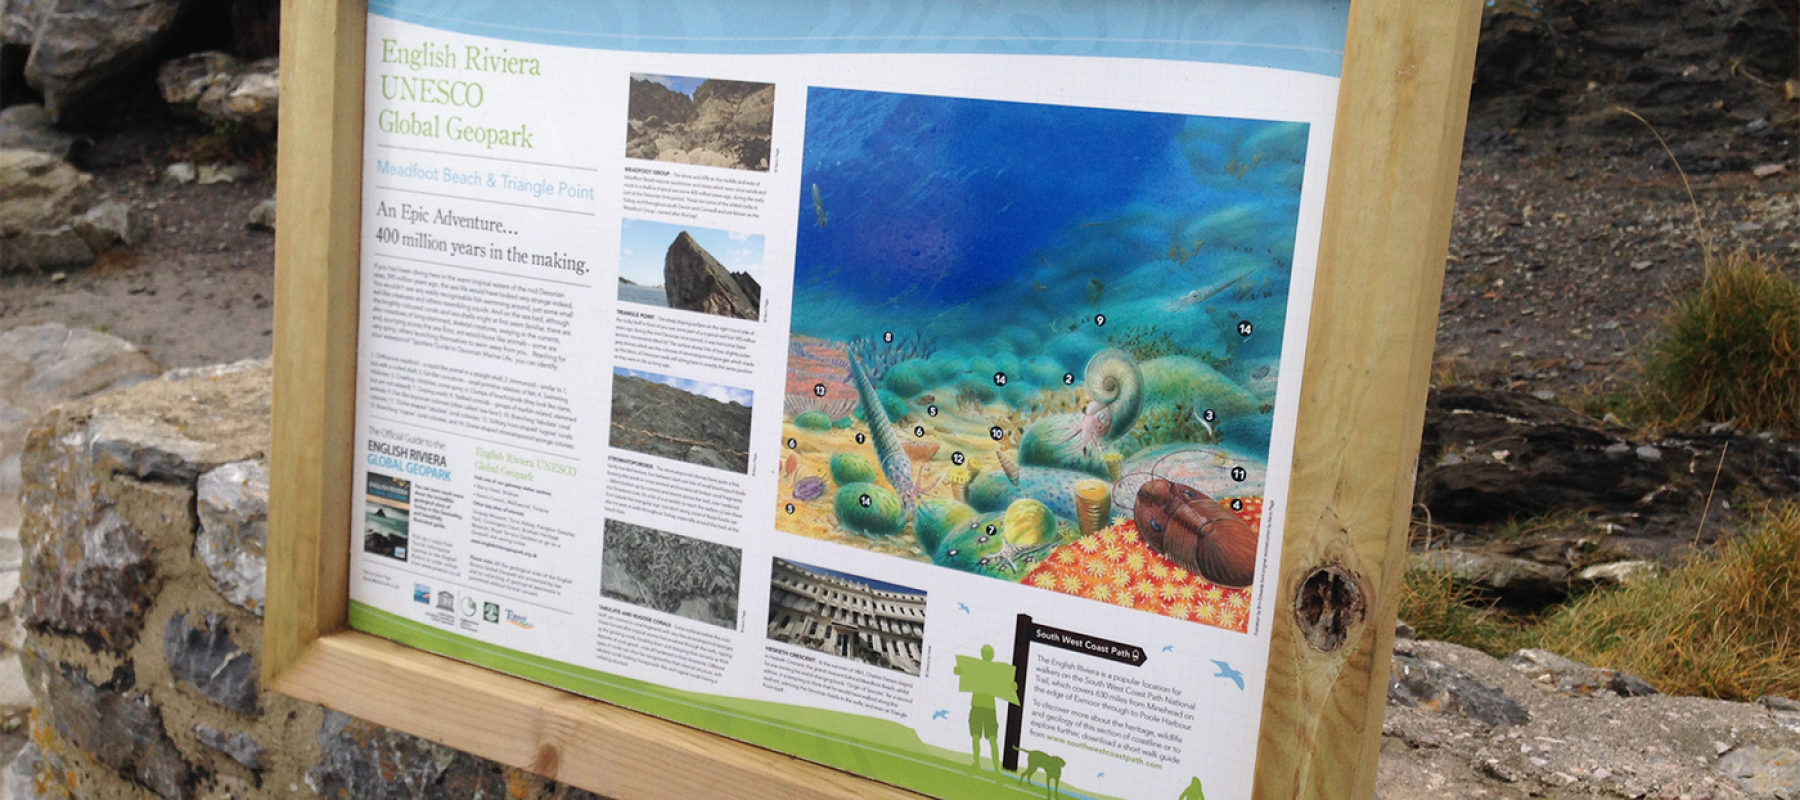 Geopark interpretation boards on display in Torbay